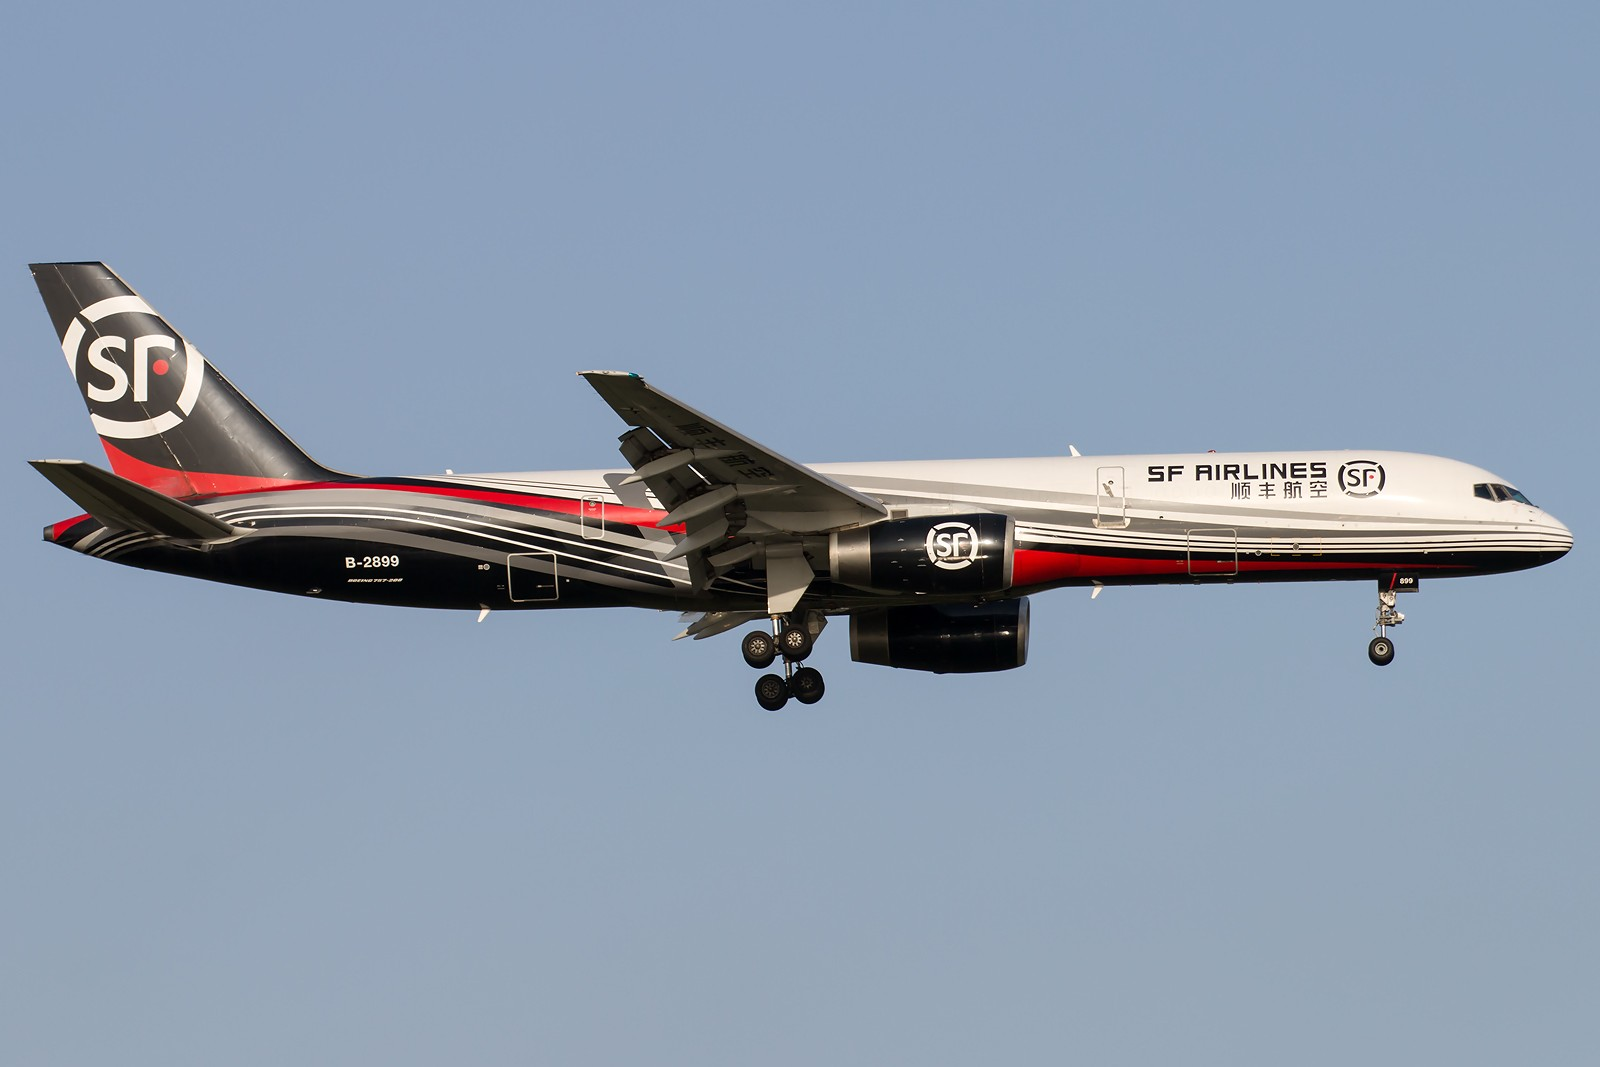 Re:[原创]晨练的季节到了 1600*1067 [8pics] BOEING 757-21B(PCF) B-2899 中国北京首都国际机场